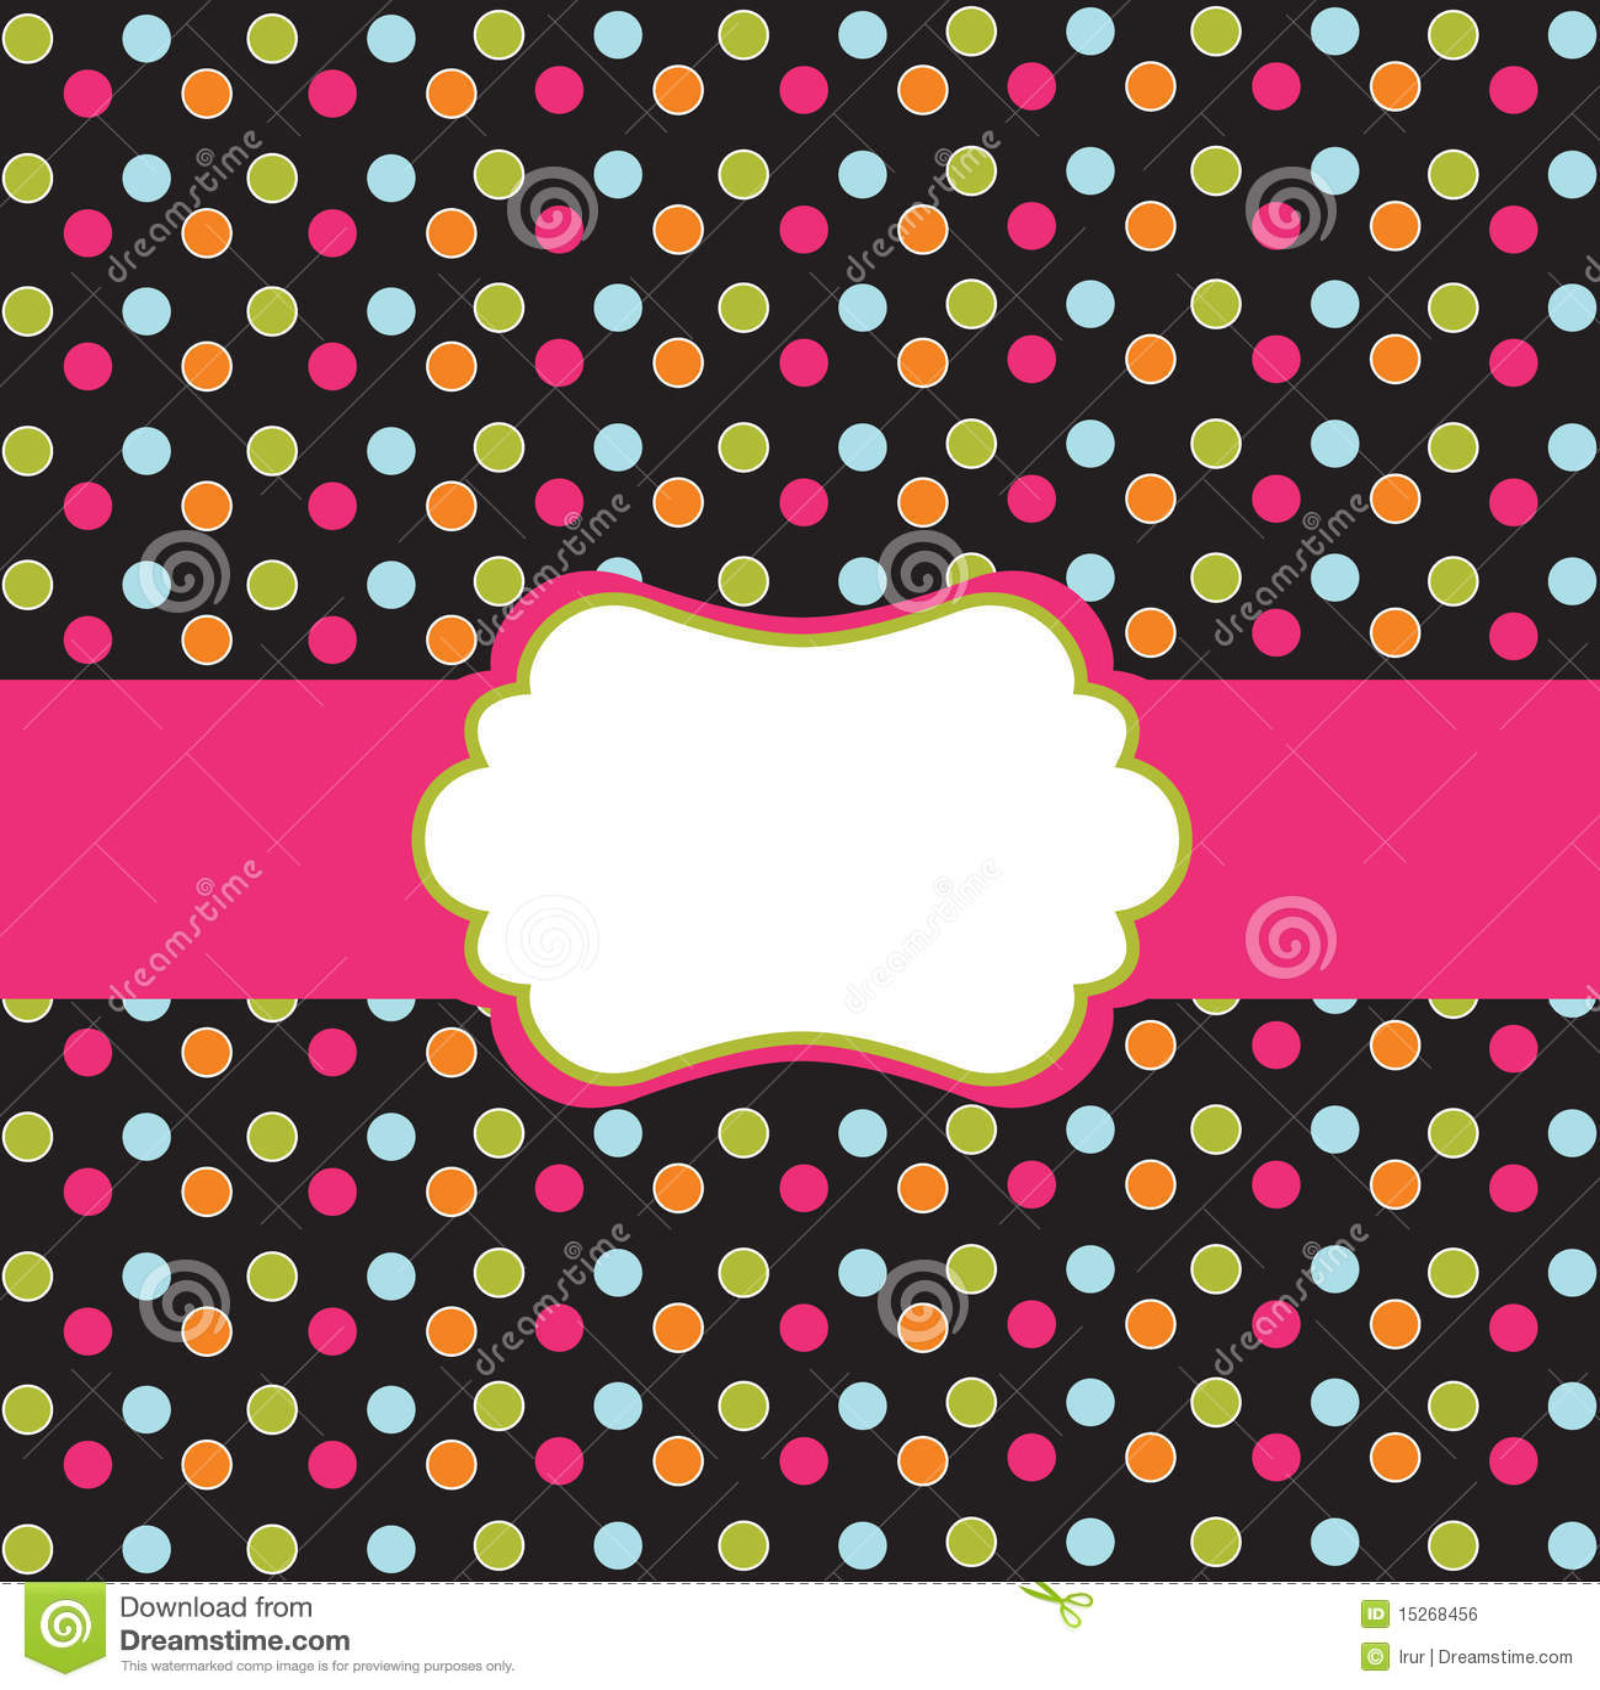 Polka dot design with frame